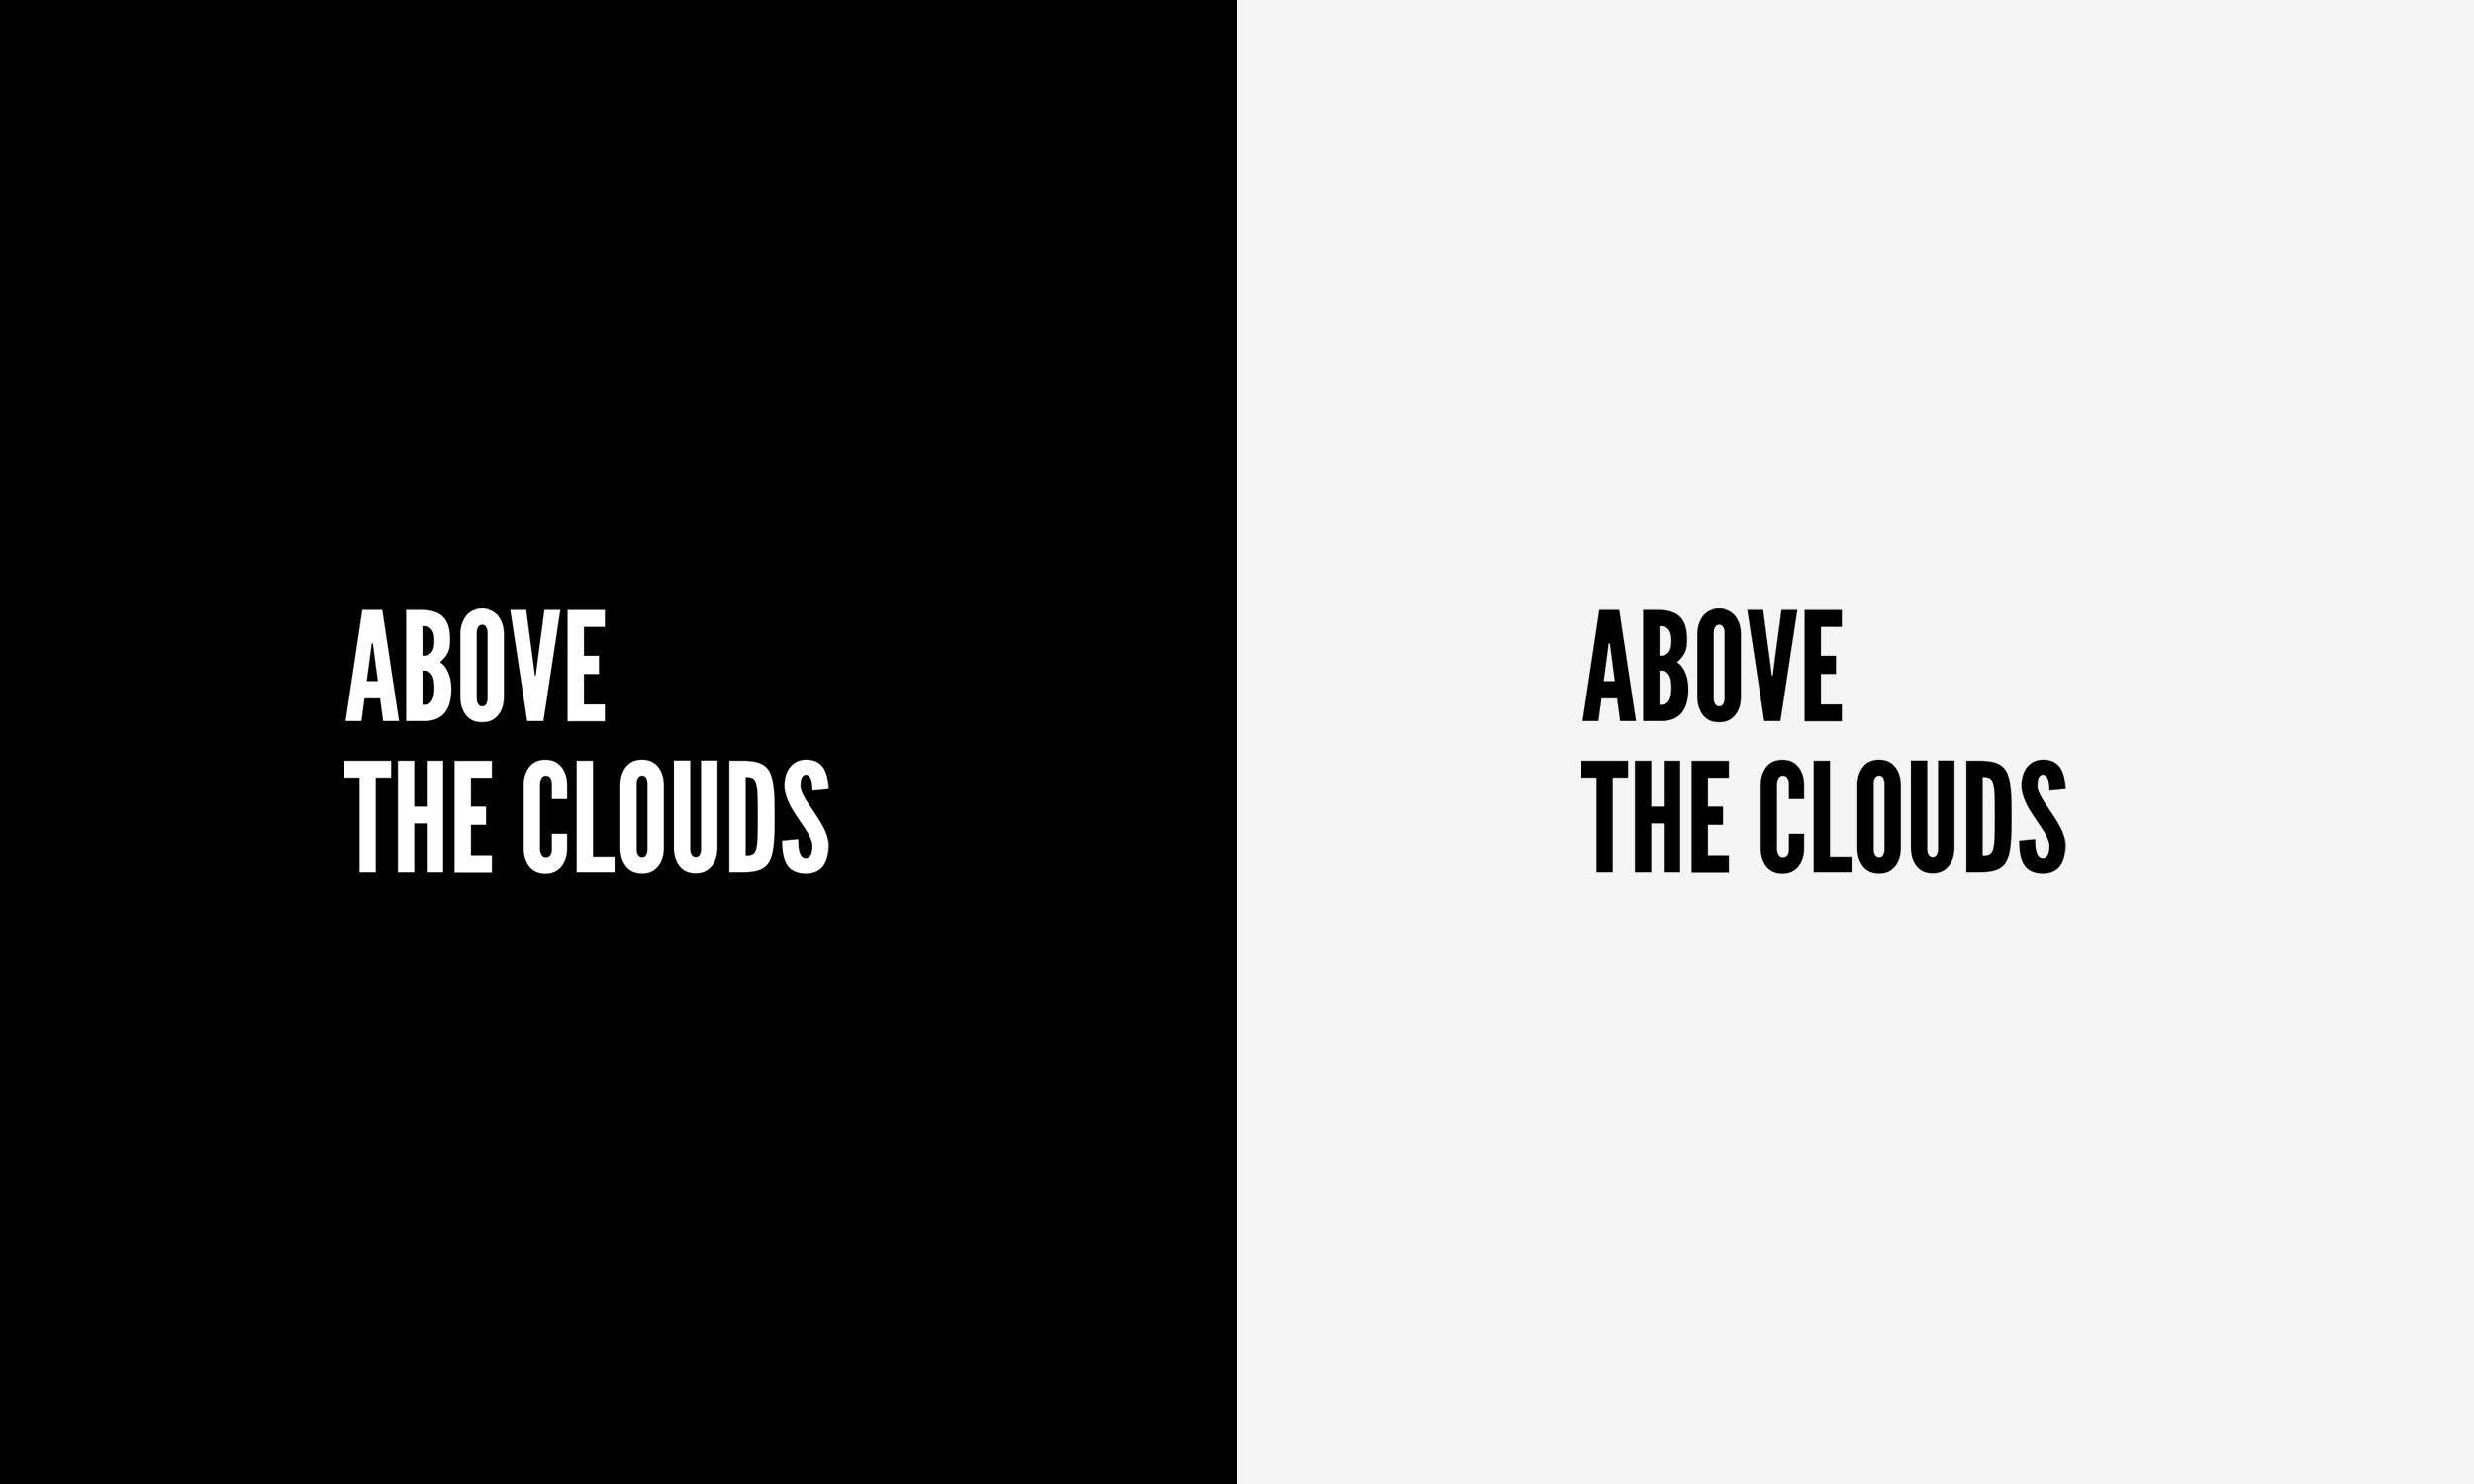 Nectar-&-Co-Above-The-Clouds-Alternative-Logo.jpg